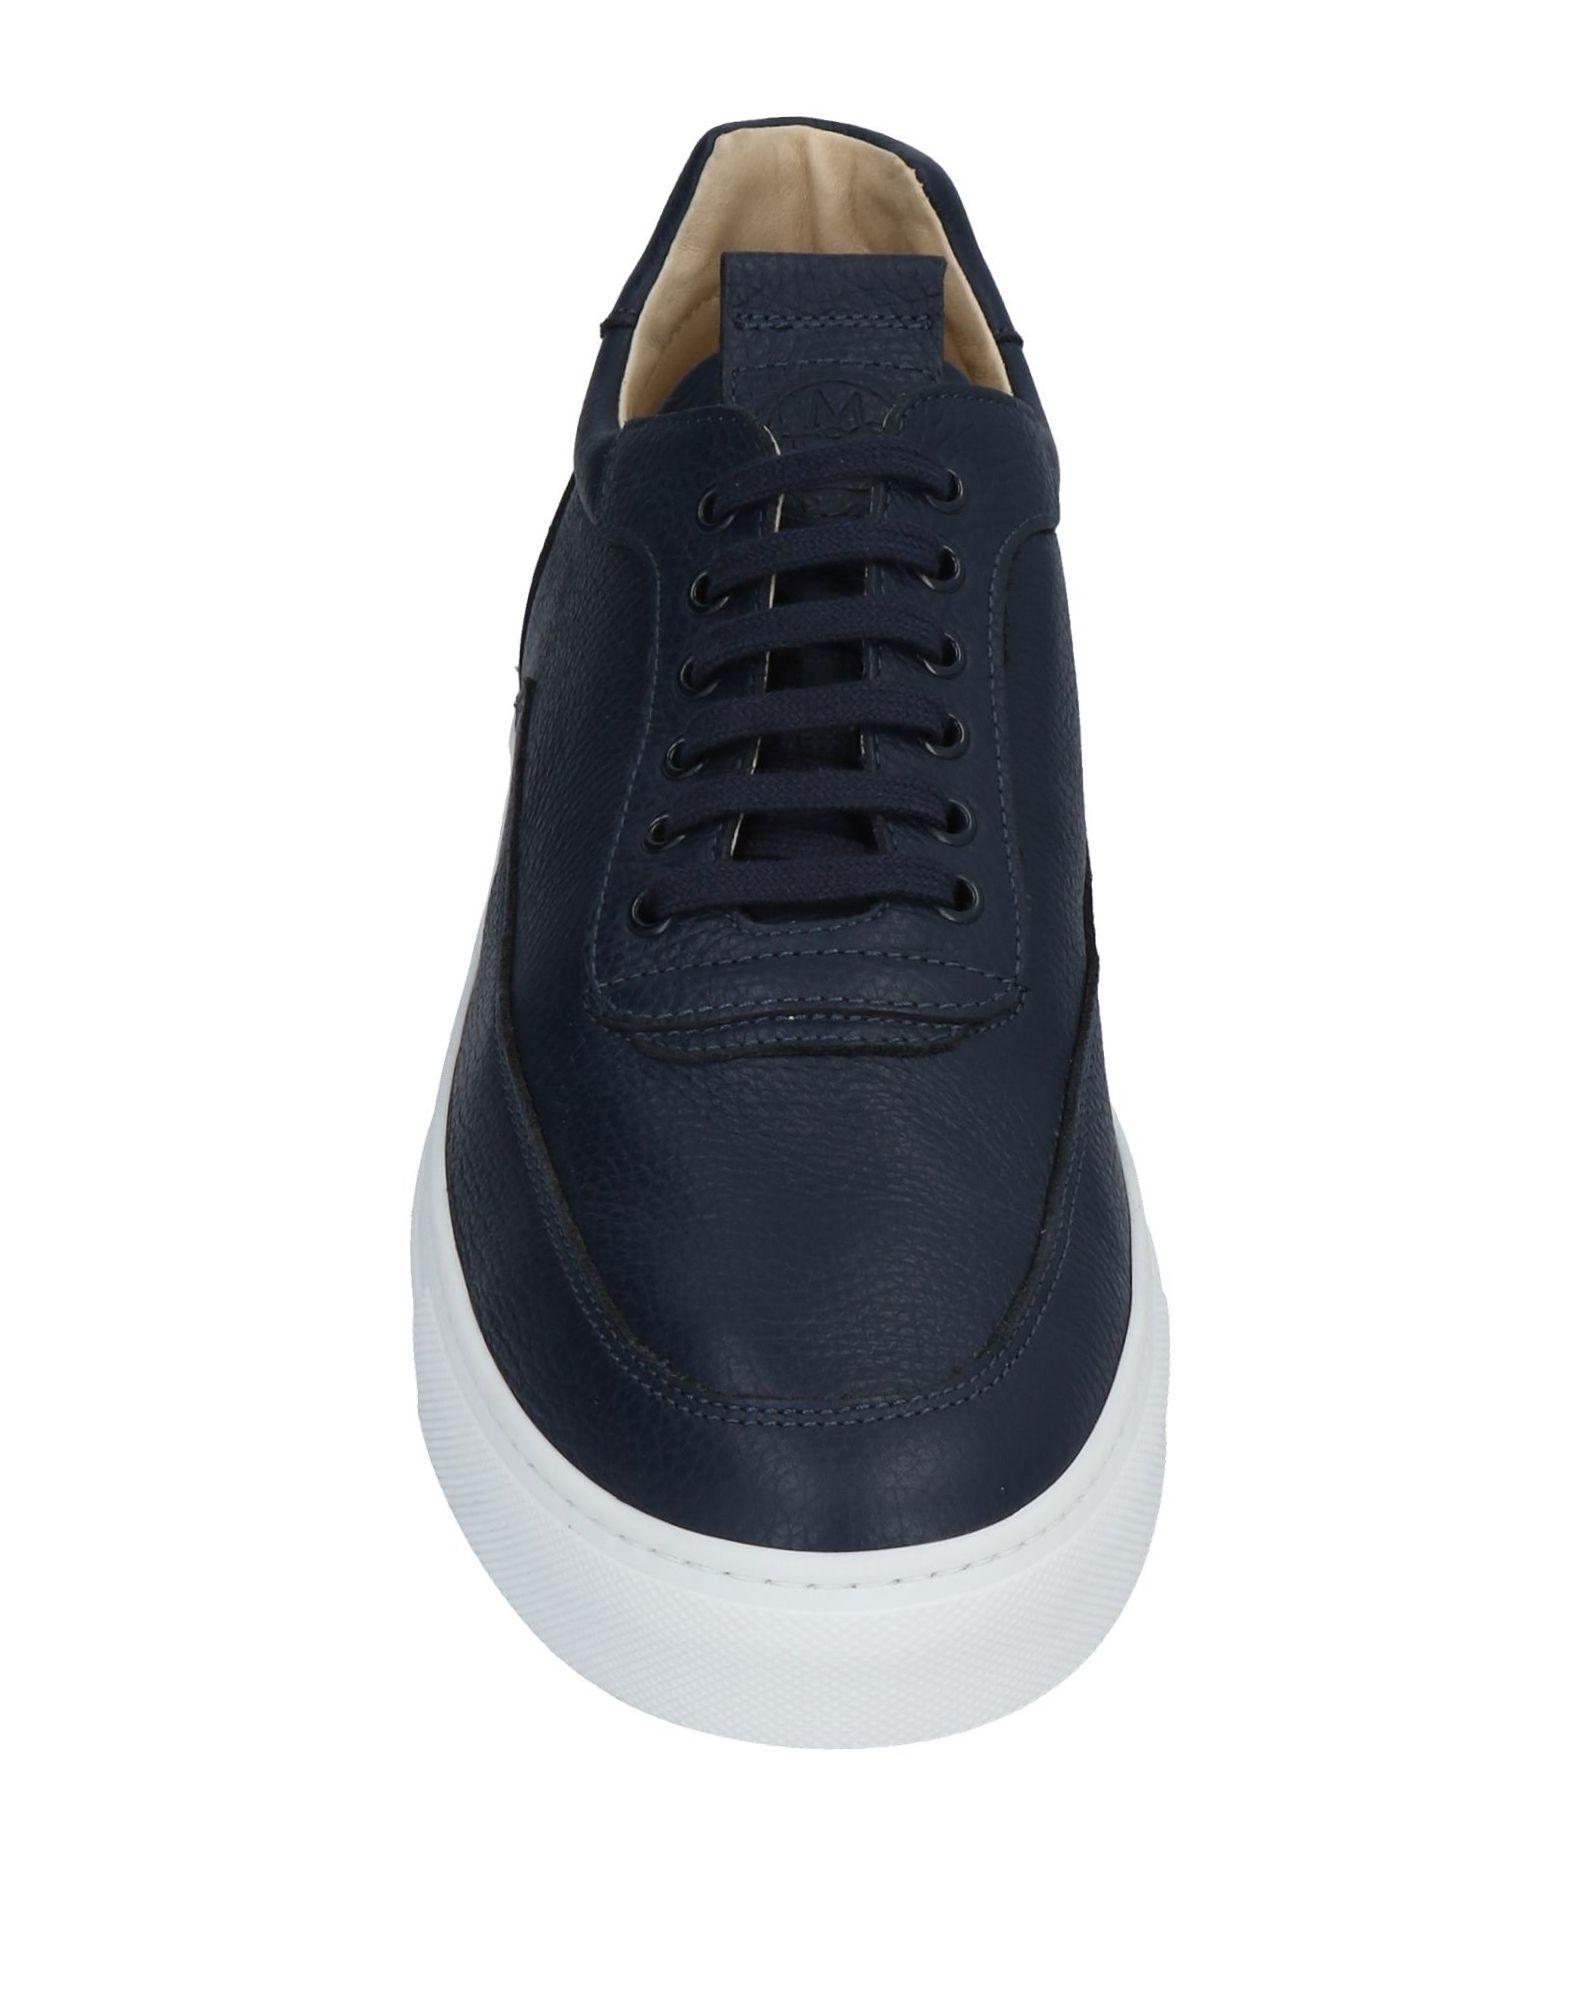 Mariano Sneakers Di Vaio Sneakers Mariano Herren  11496874SI bbf6bd